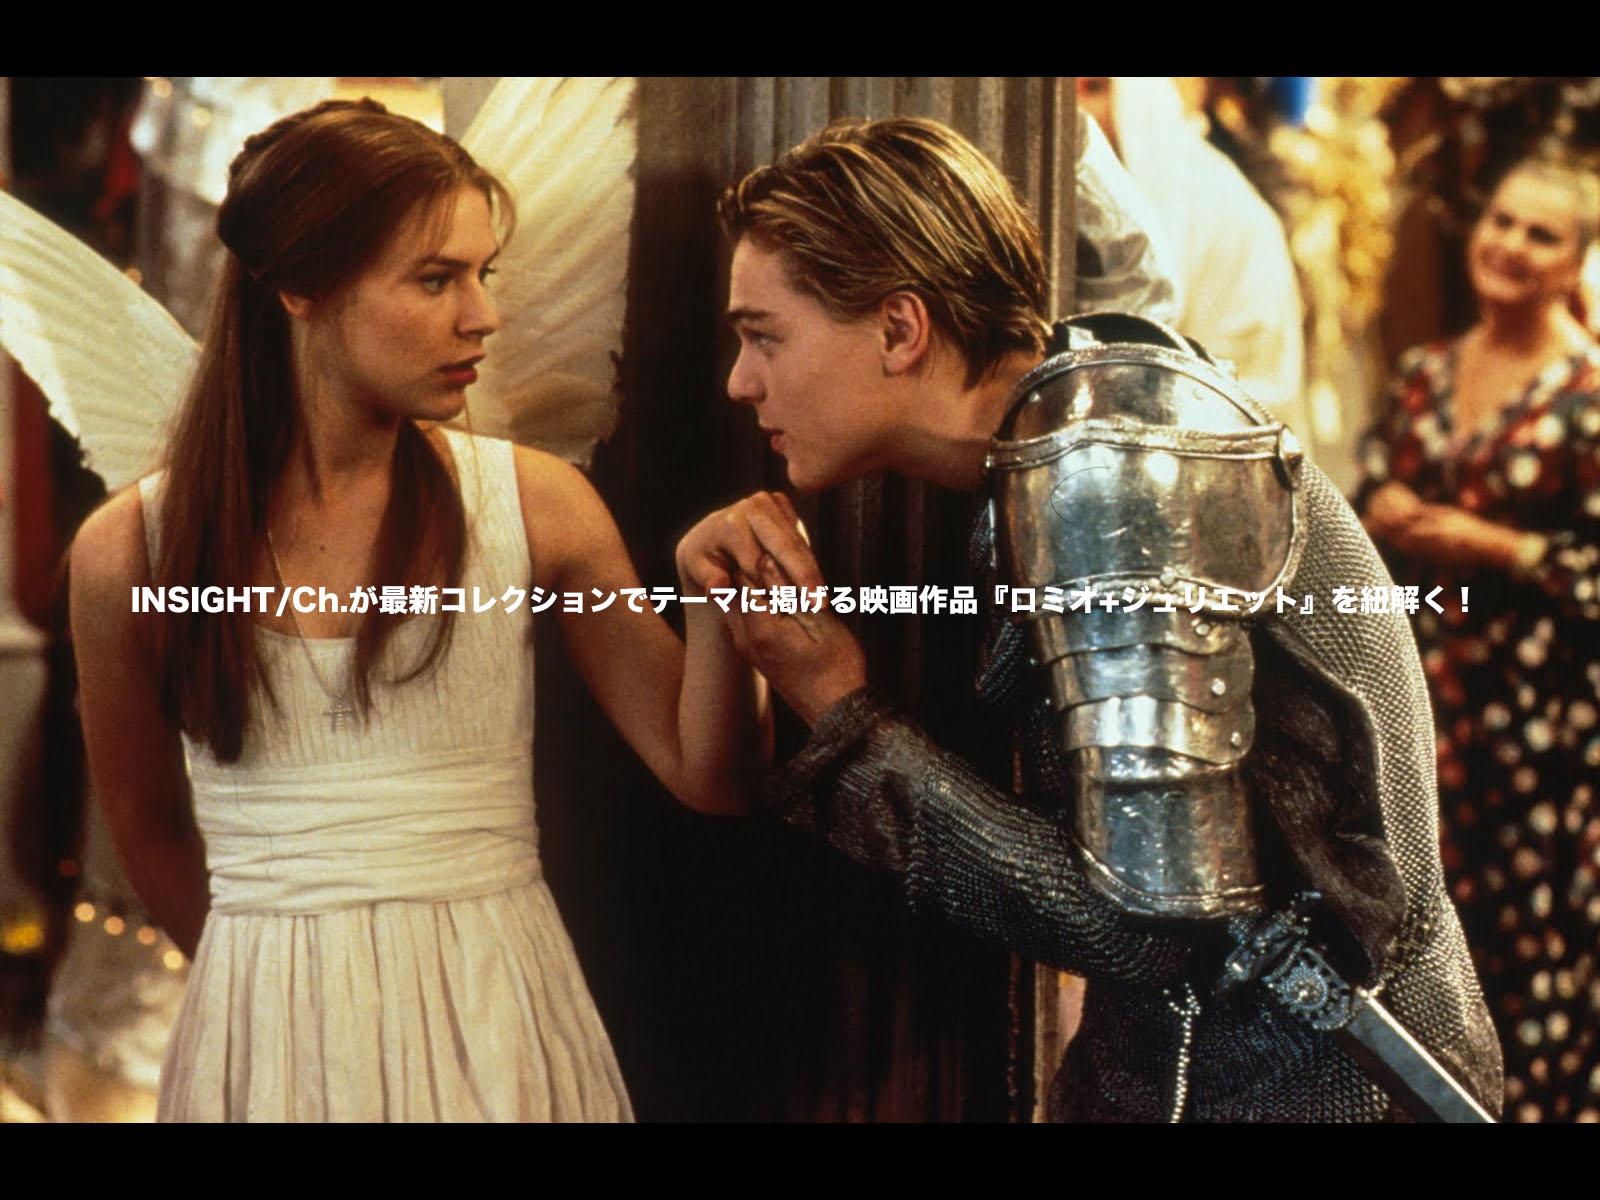 INSIGHT/Ch.が最新コレクションでテーマに掲げる映画作品 ロミオ+ジュリエット を紐解く!